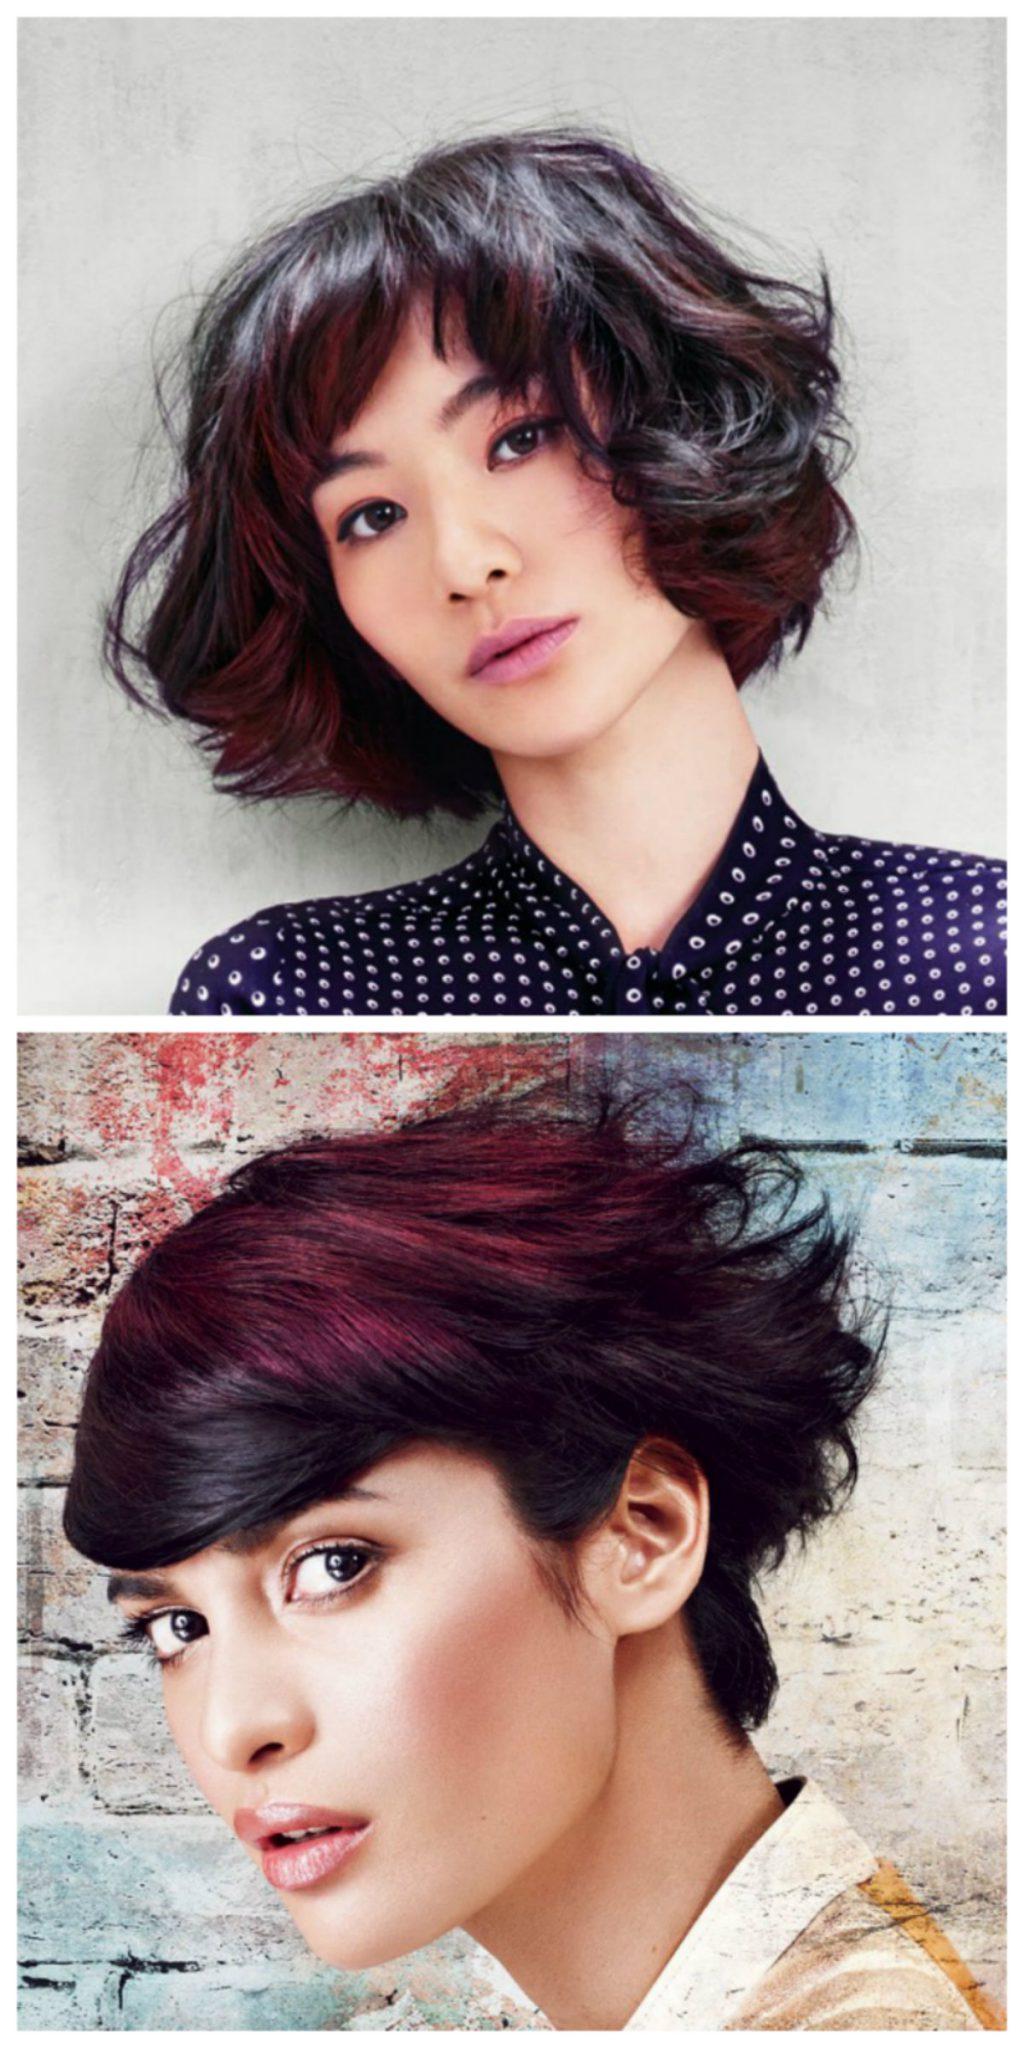 как быстро поменять цвет волос на фото онлайн